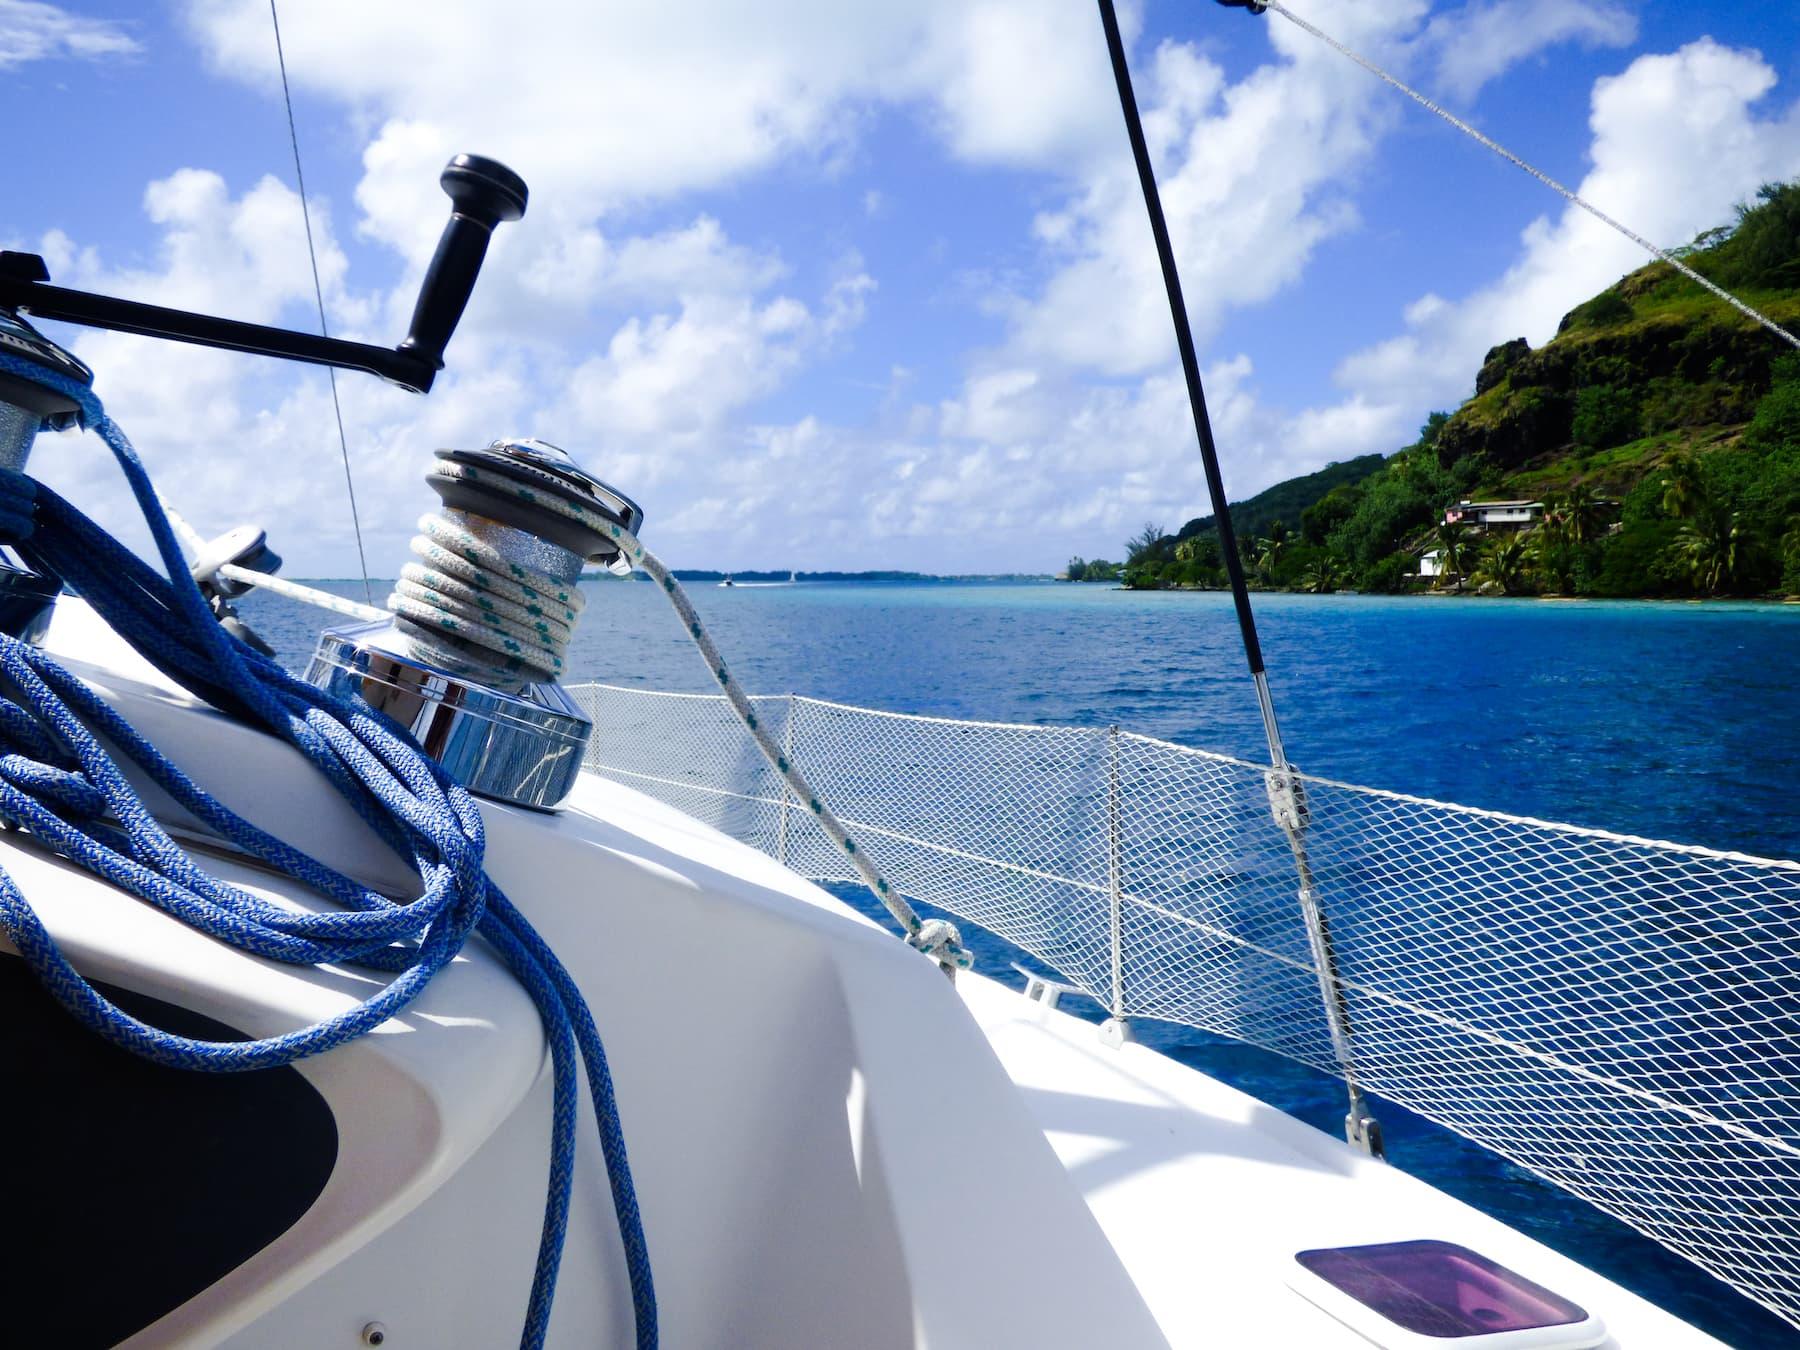 https://tahititourisme.com.au/wp-content/uploads/2017/08/bateau-tlc-modif-13.jpg